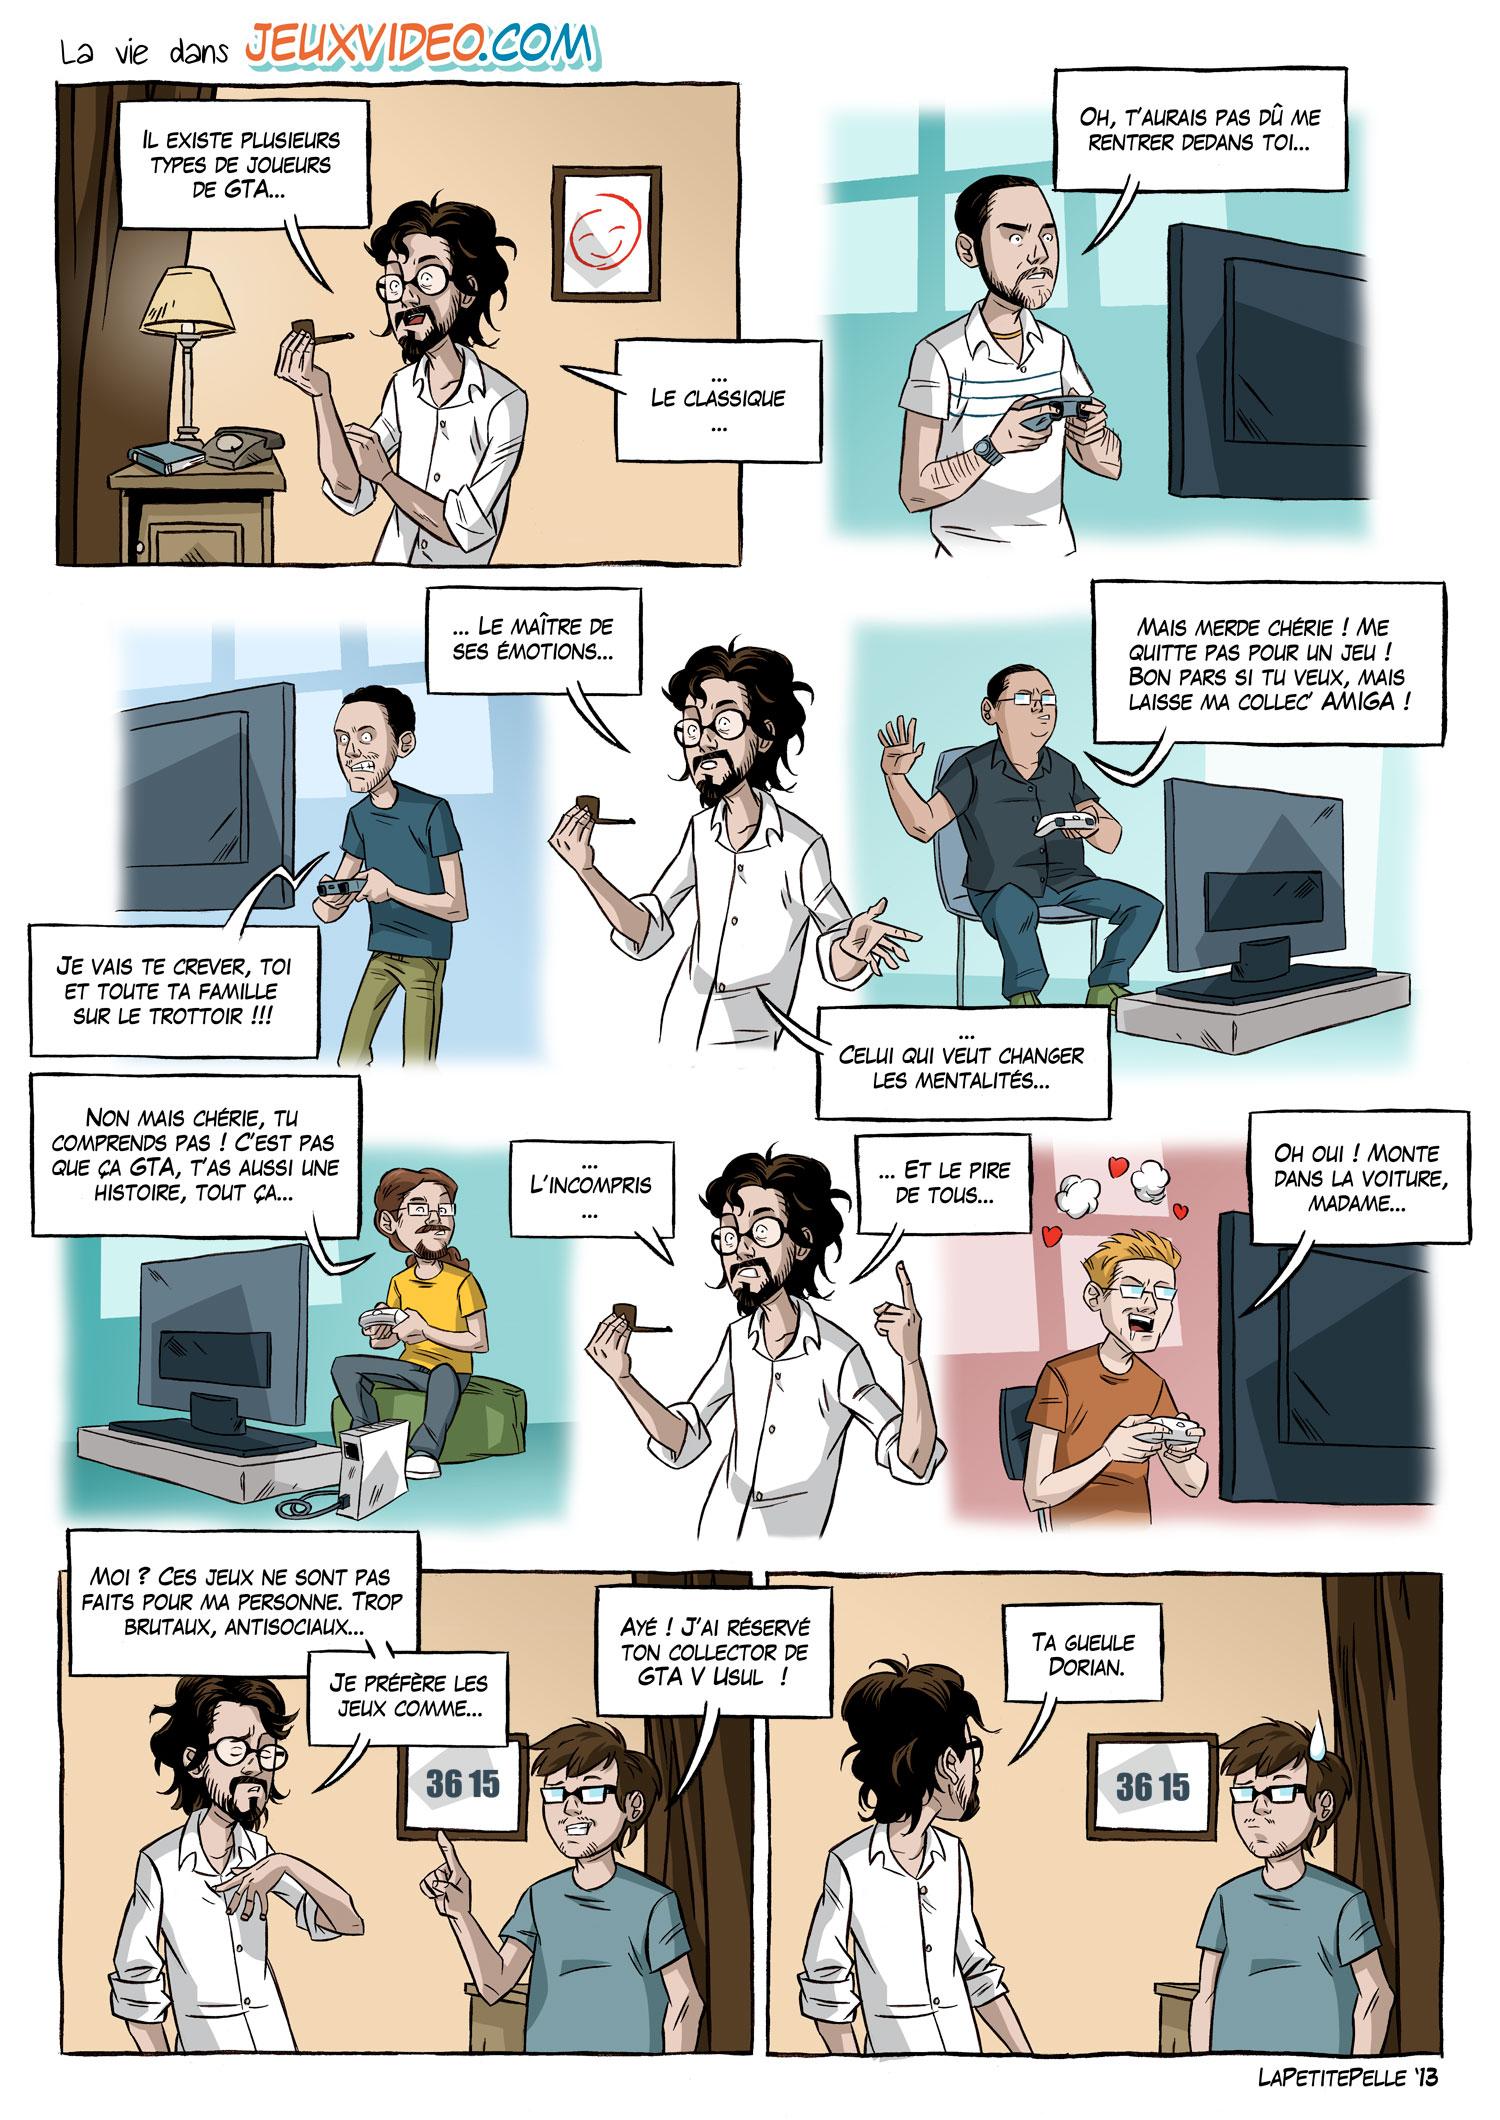 LaPetitePelle dessine jeuxvideo.com - N°6